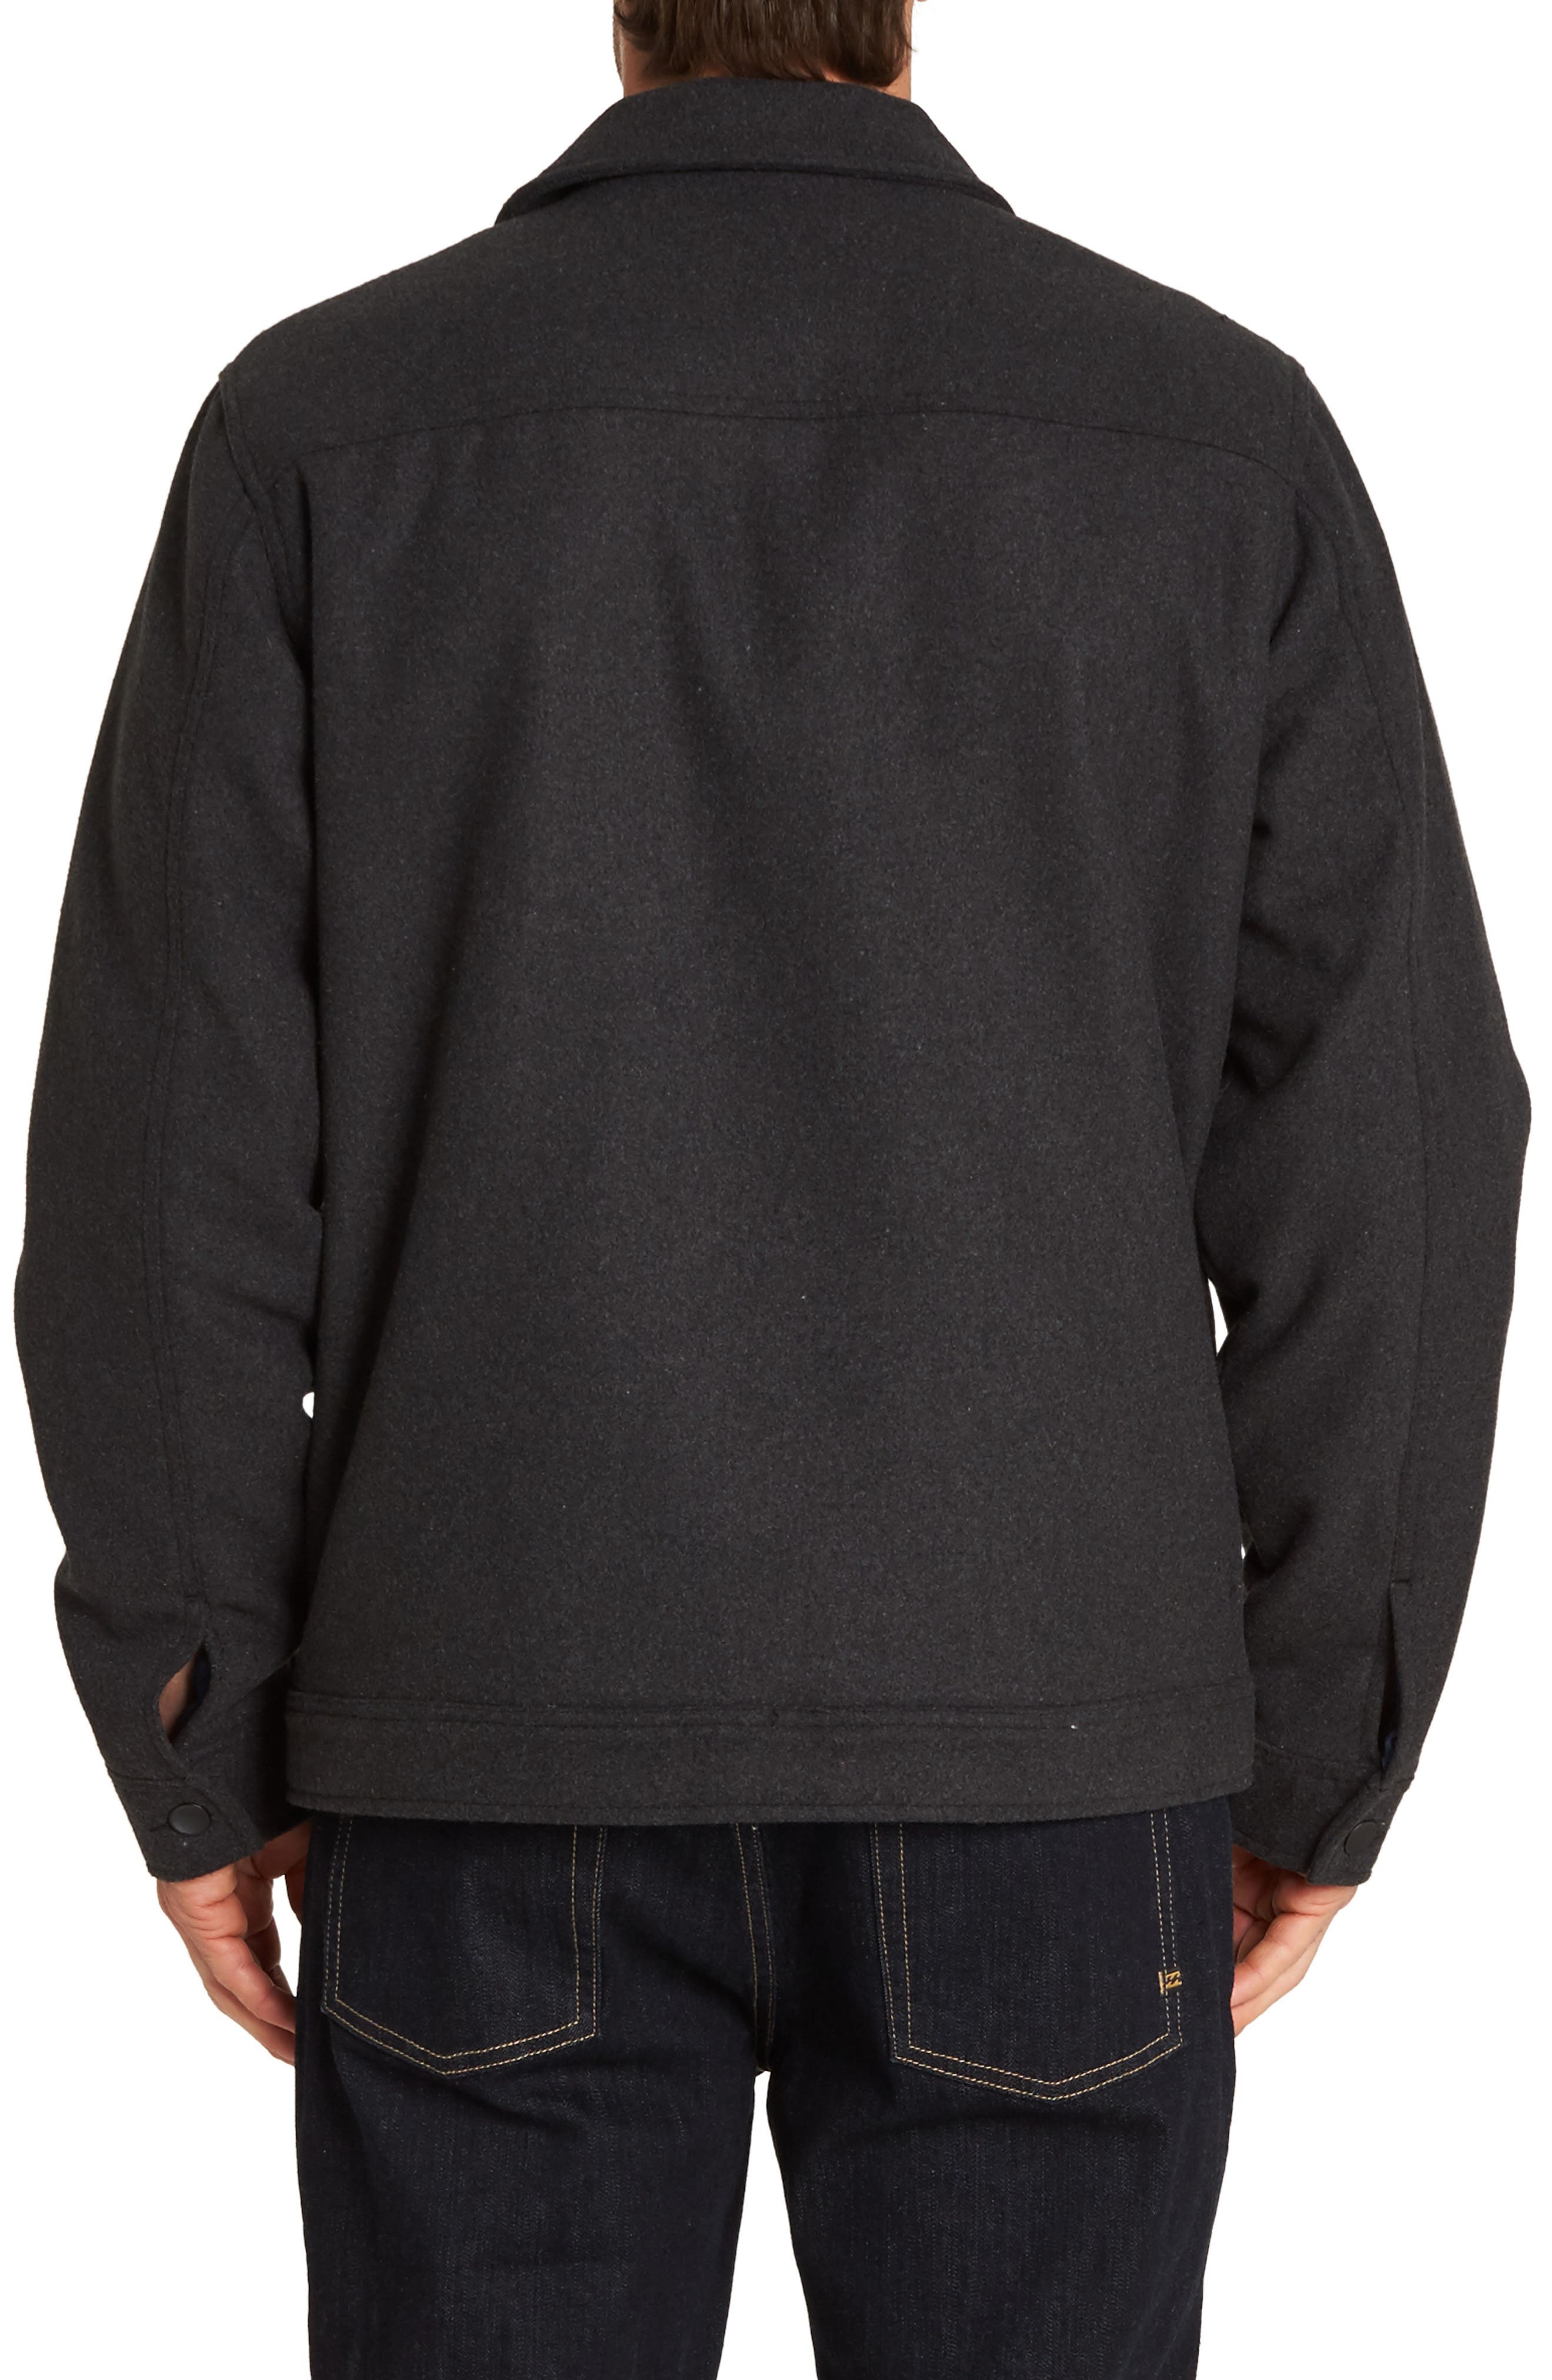 Barlow Jacket,                             Alternate thumbnail 2, color,                             BLACK HEATHER